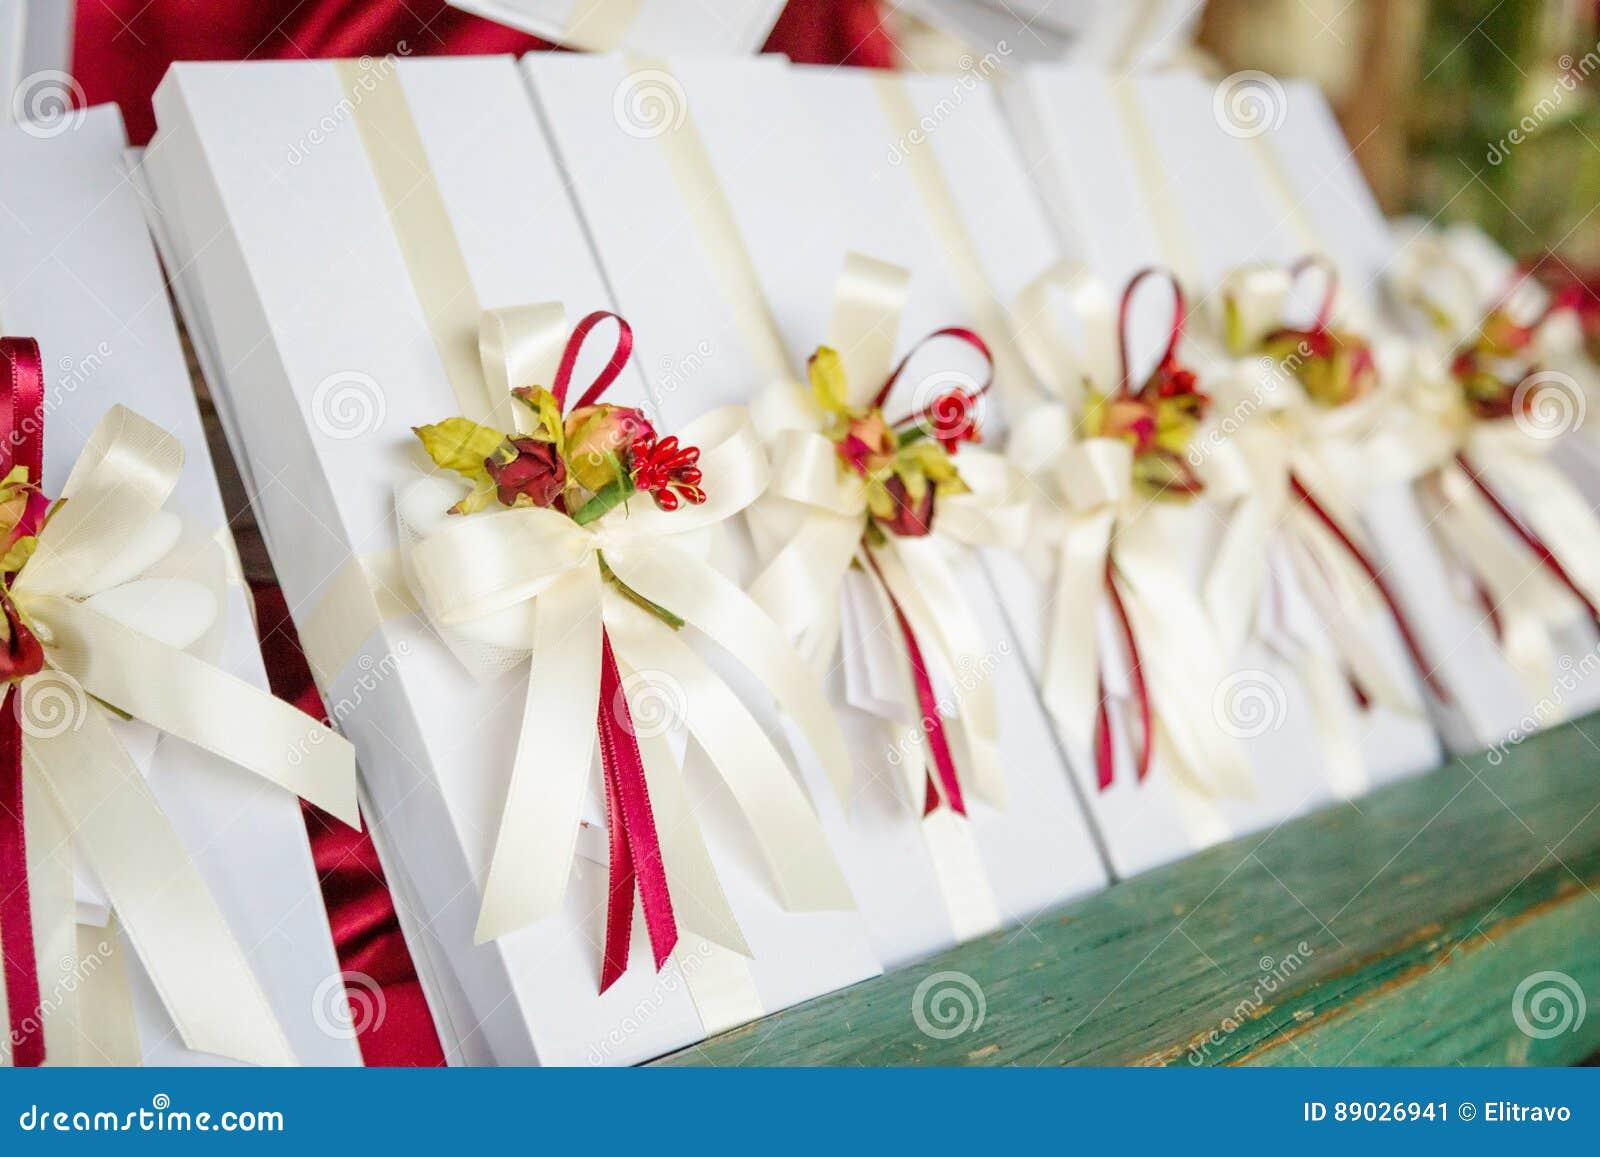 Presentes de casamento para o convidado